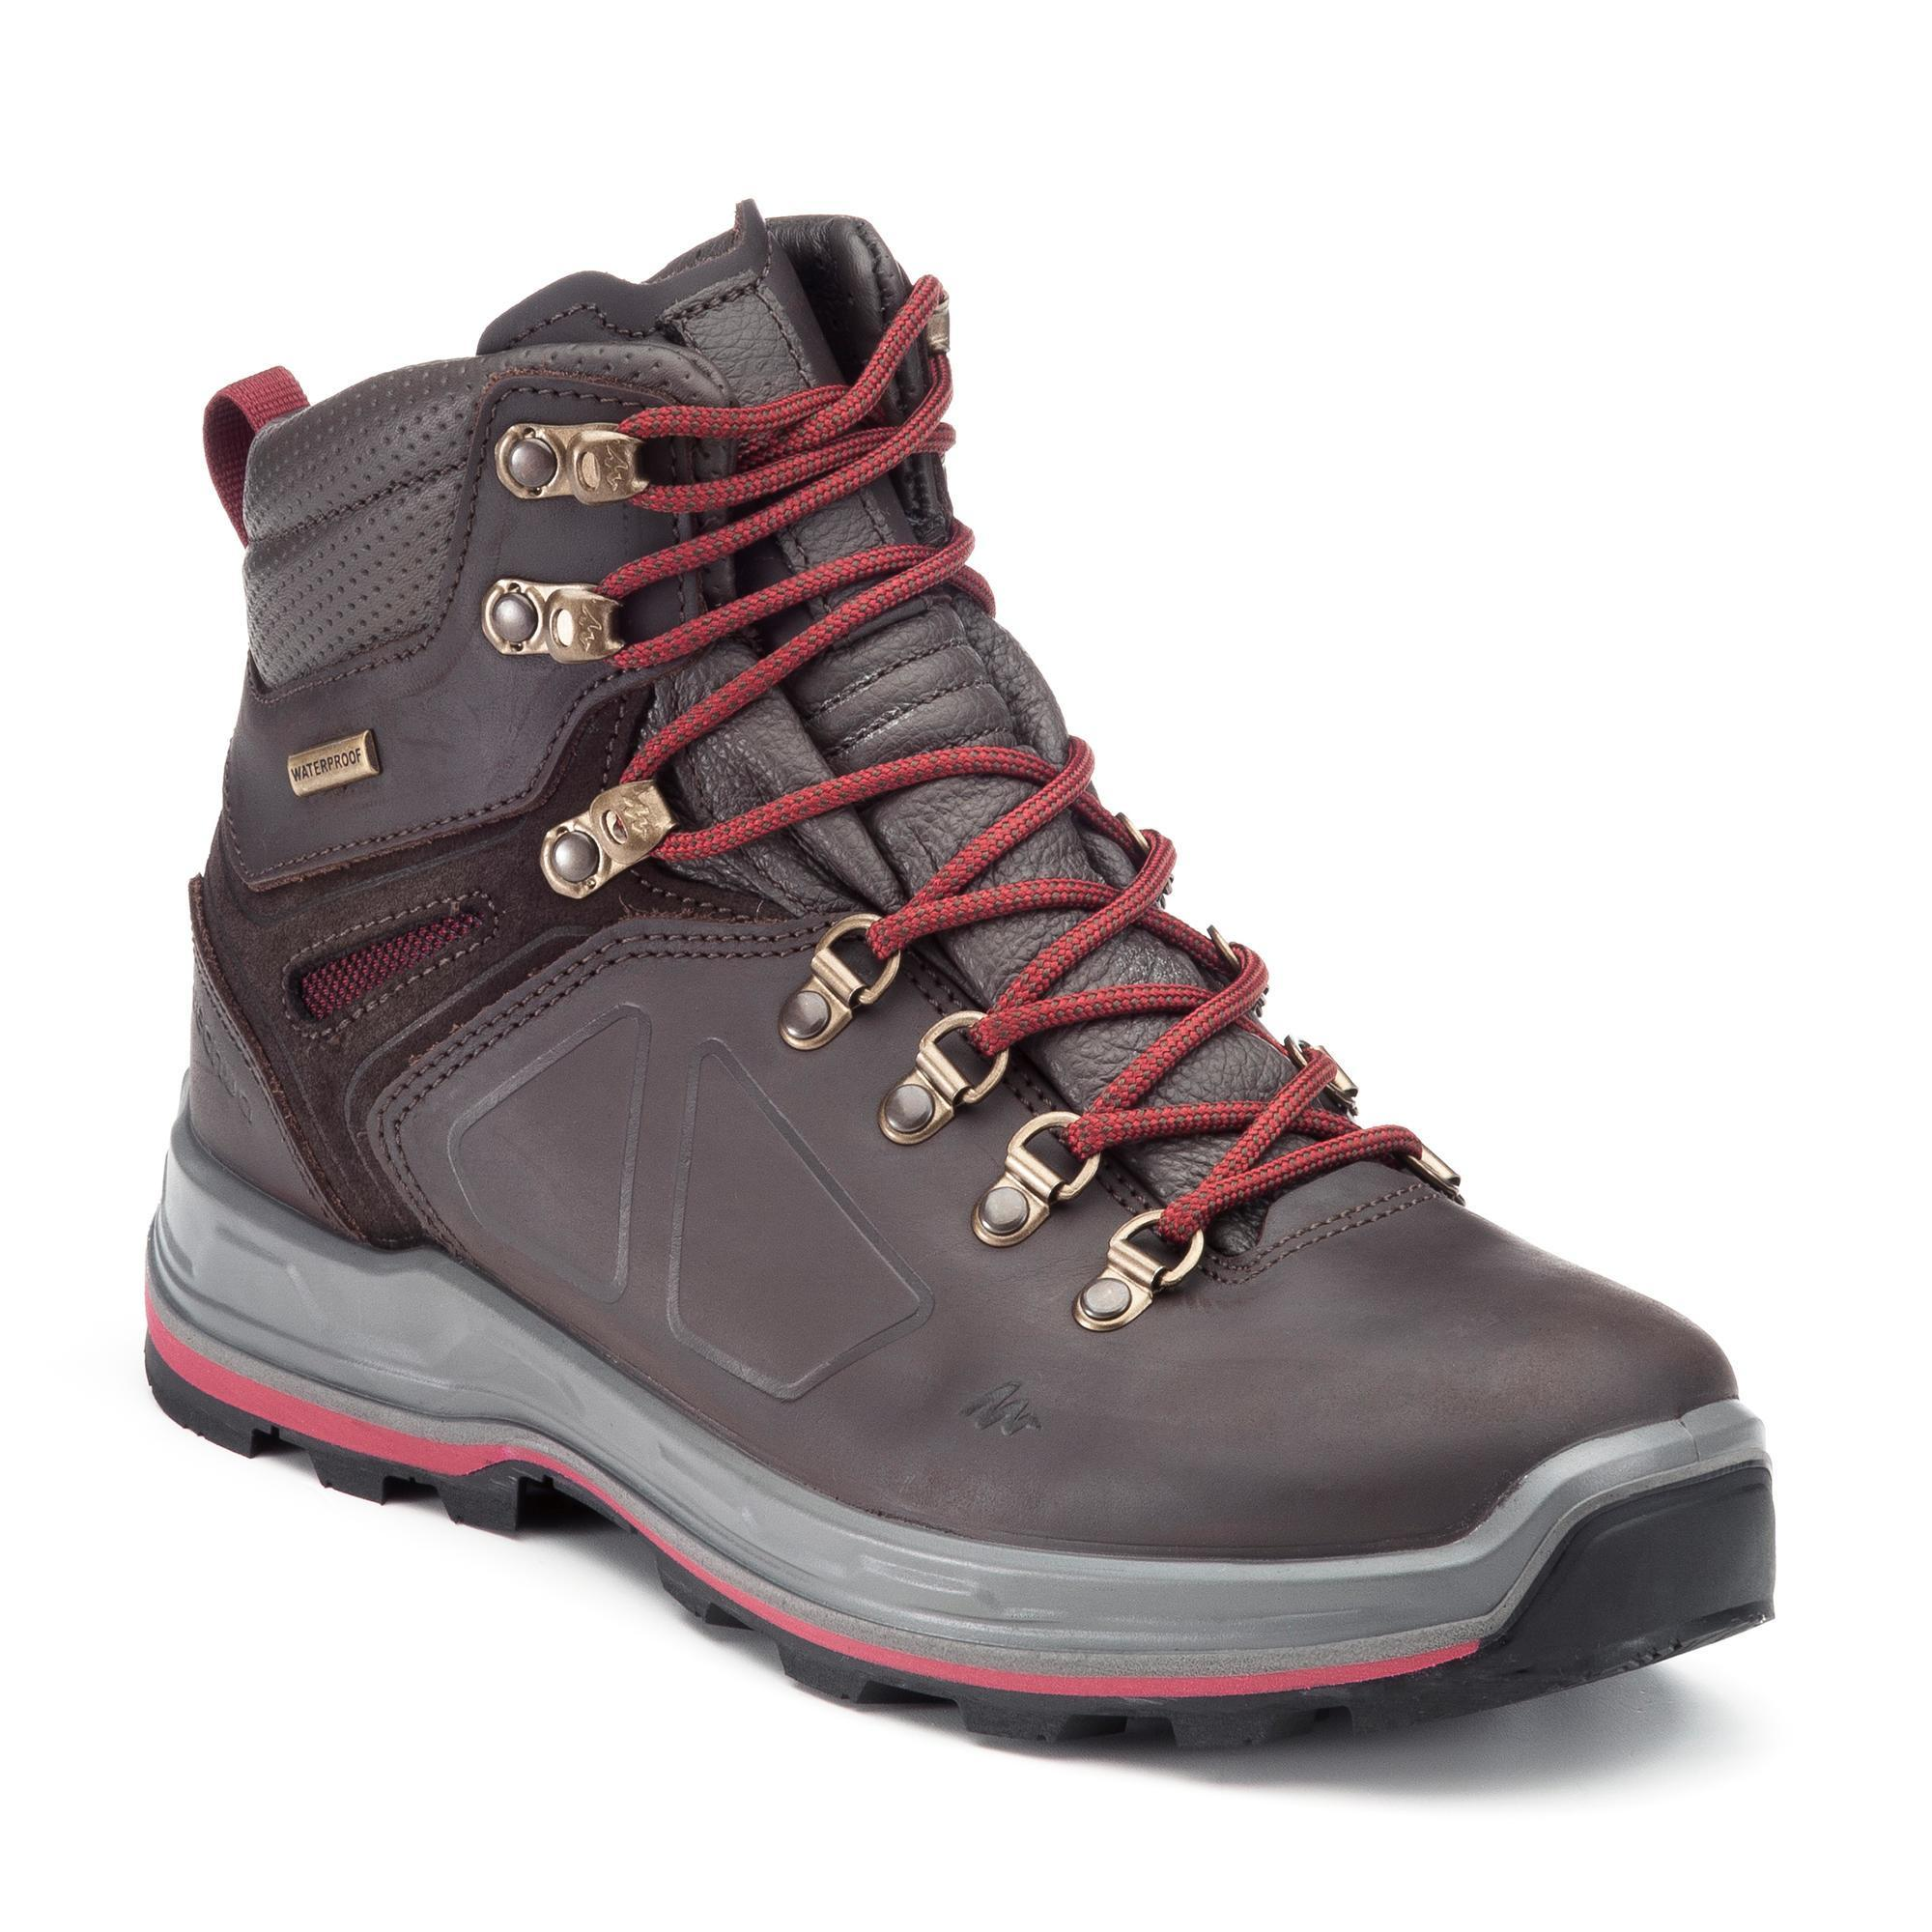 cf9d30e22d5 Comprar Botas de montaña y trekking TREK500 mujer | Decathlon